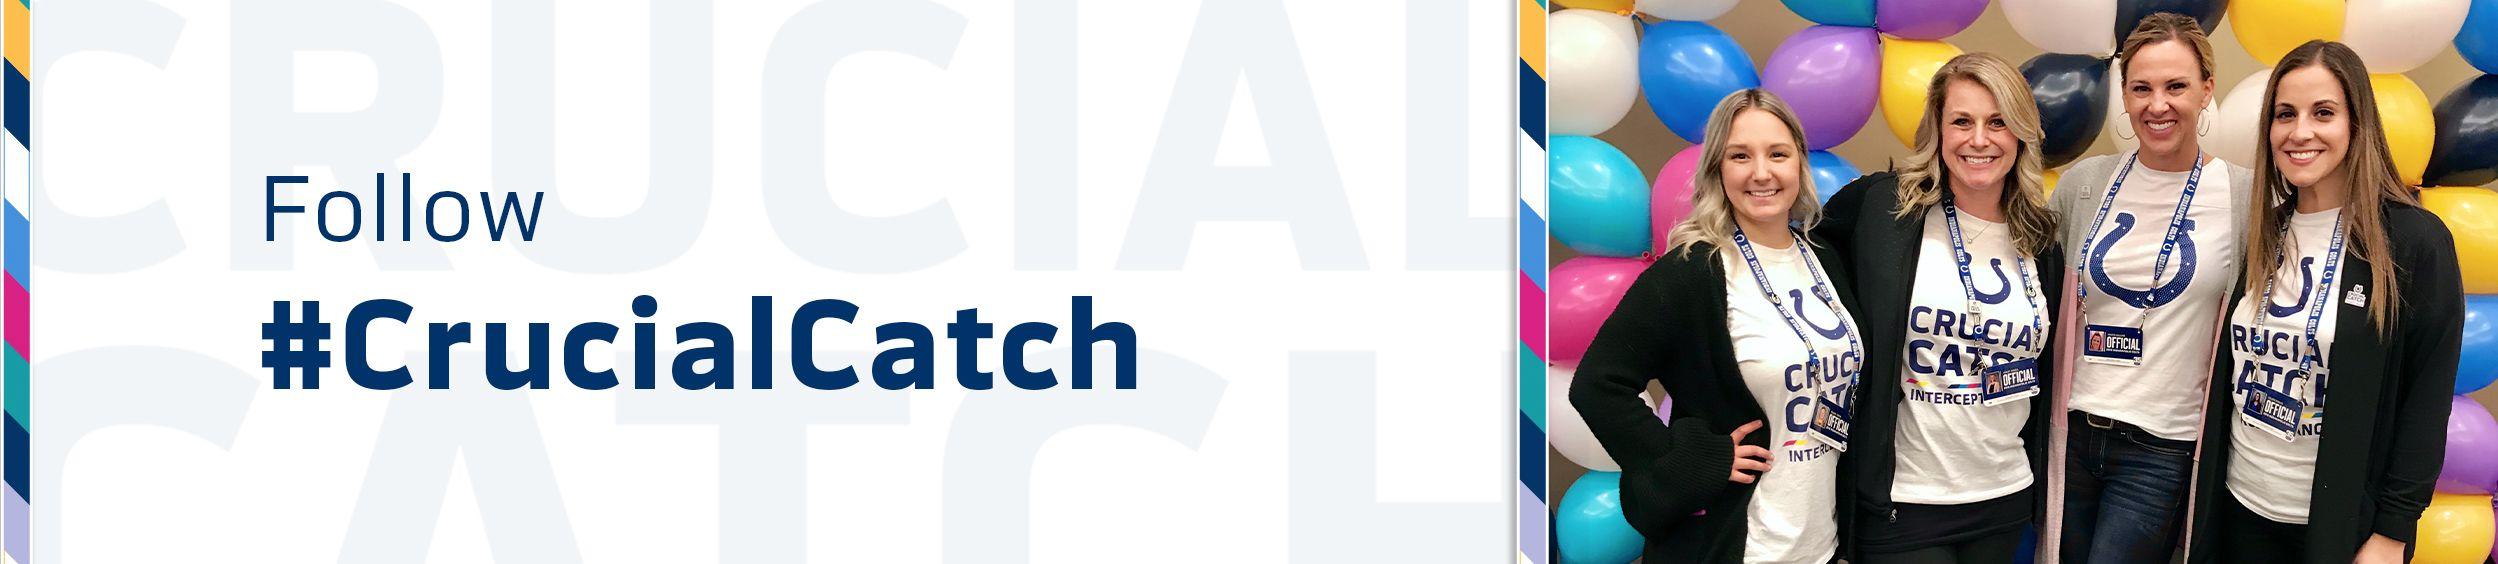 CrucialCatch_Banner_2